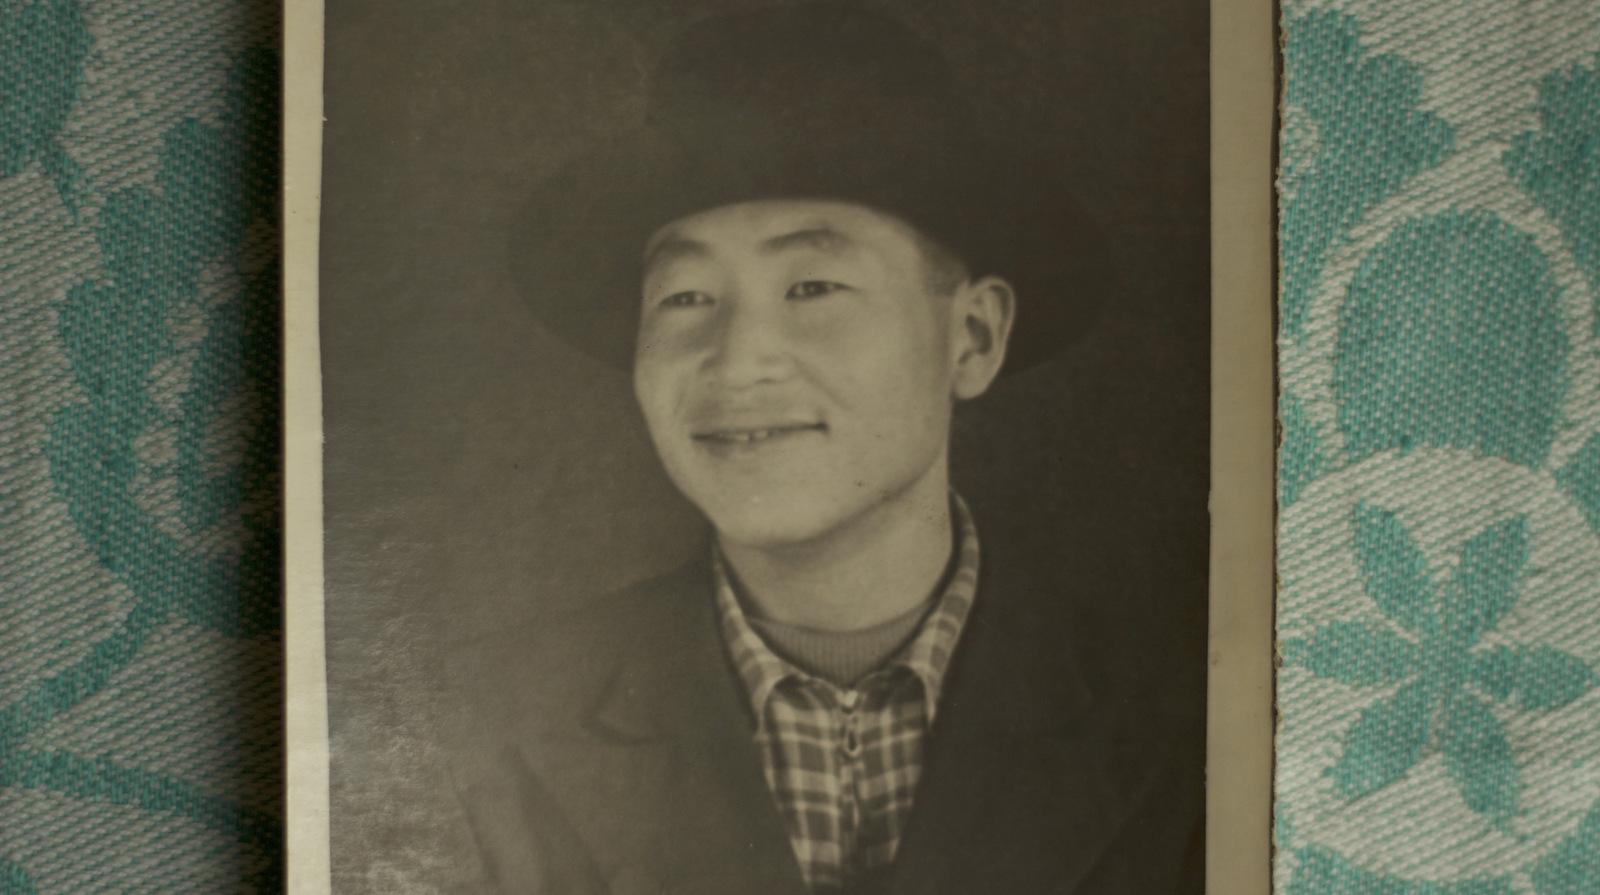 My then young grandfather Kim Da Gir